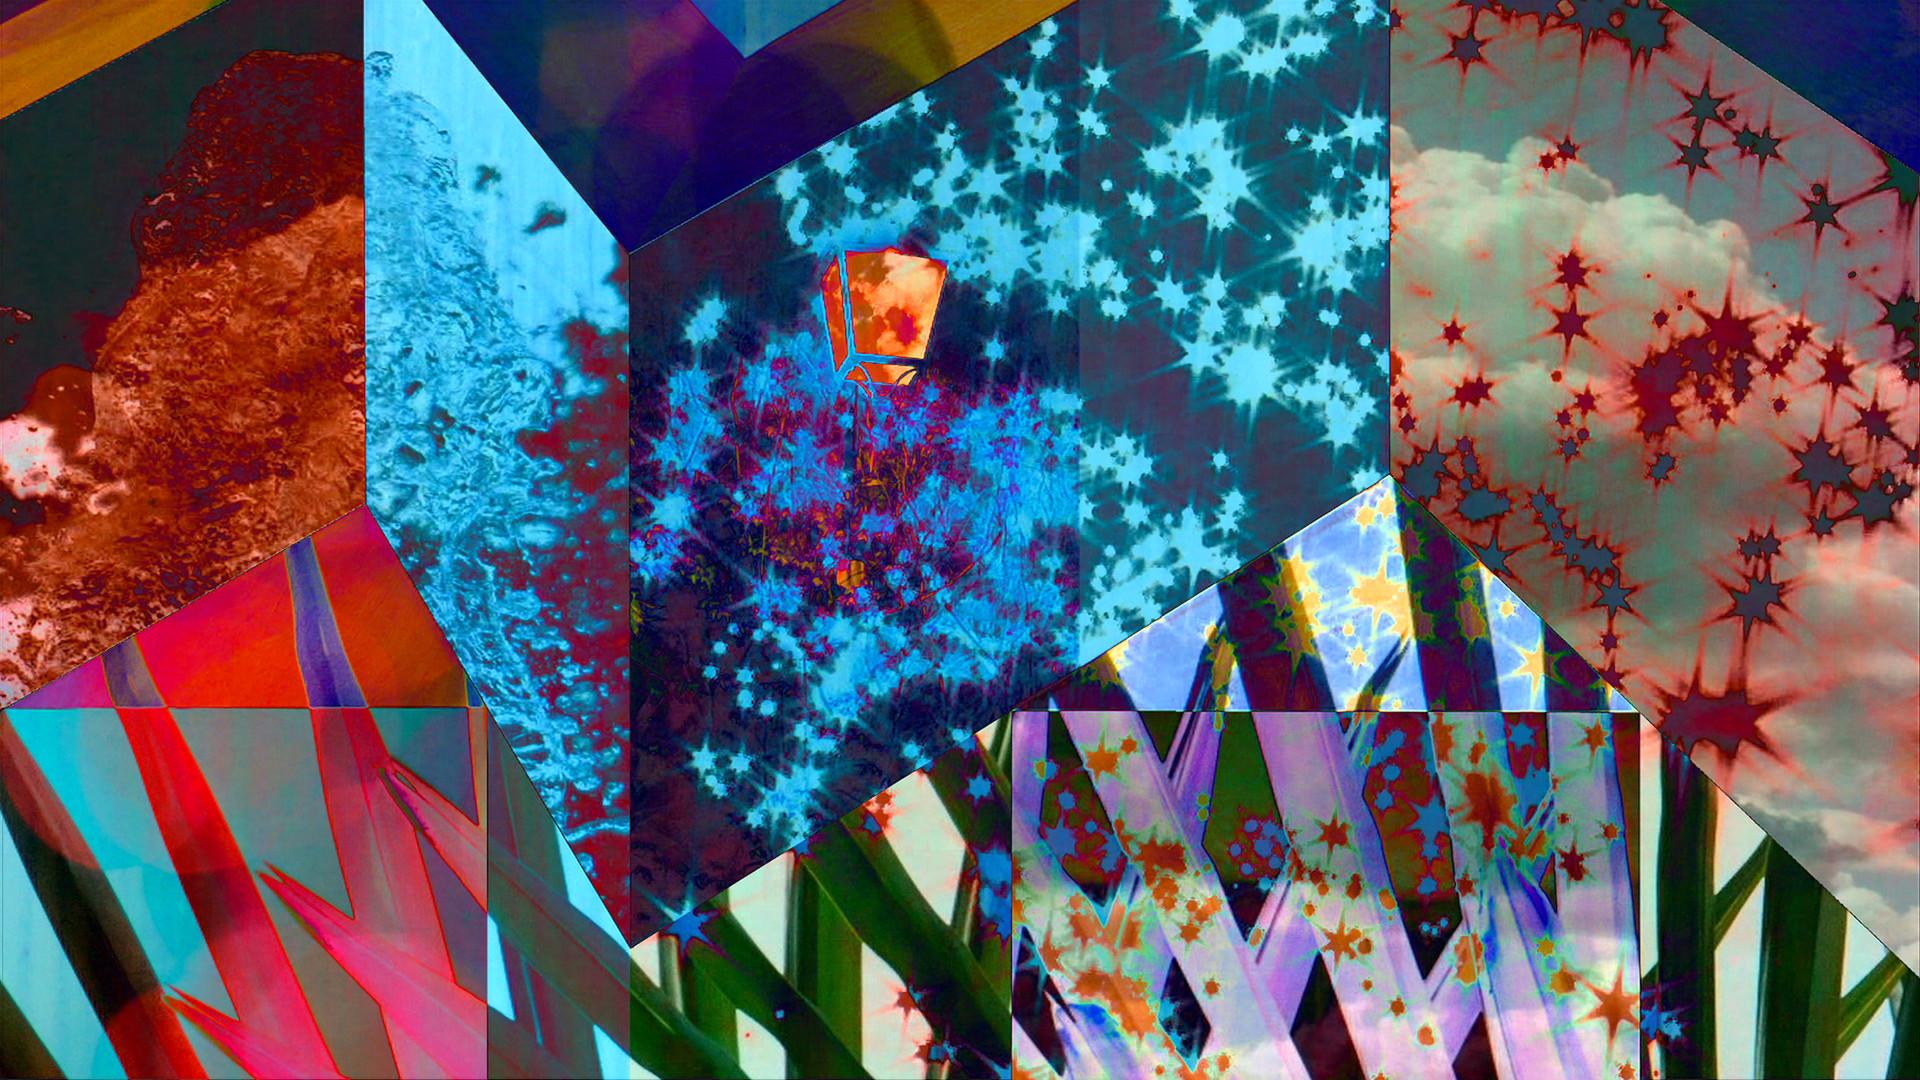 Sojung Jun, The Twelve Rooms, 2014, 48x27cm, inkjet print